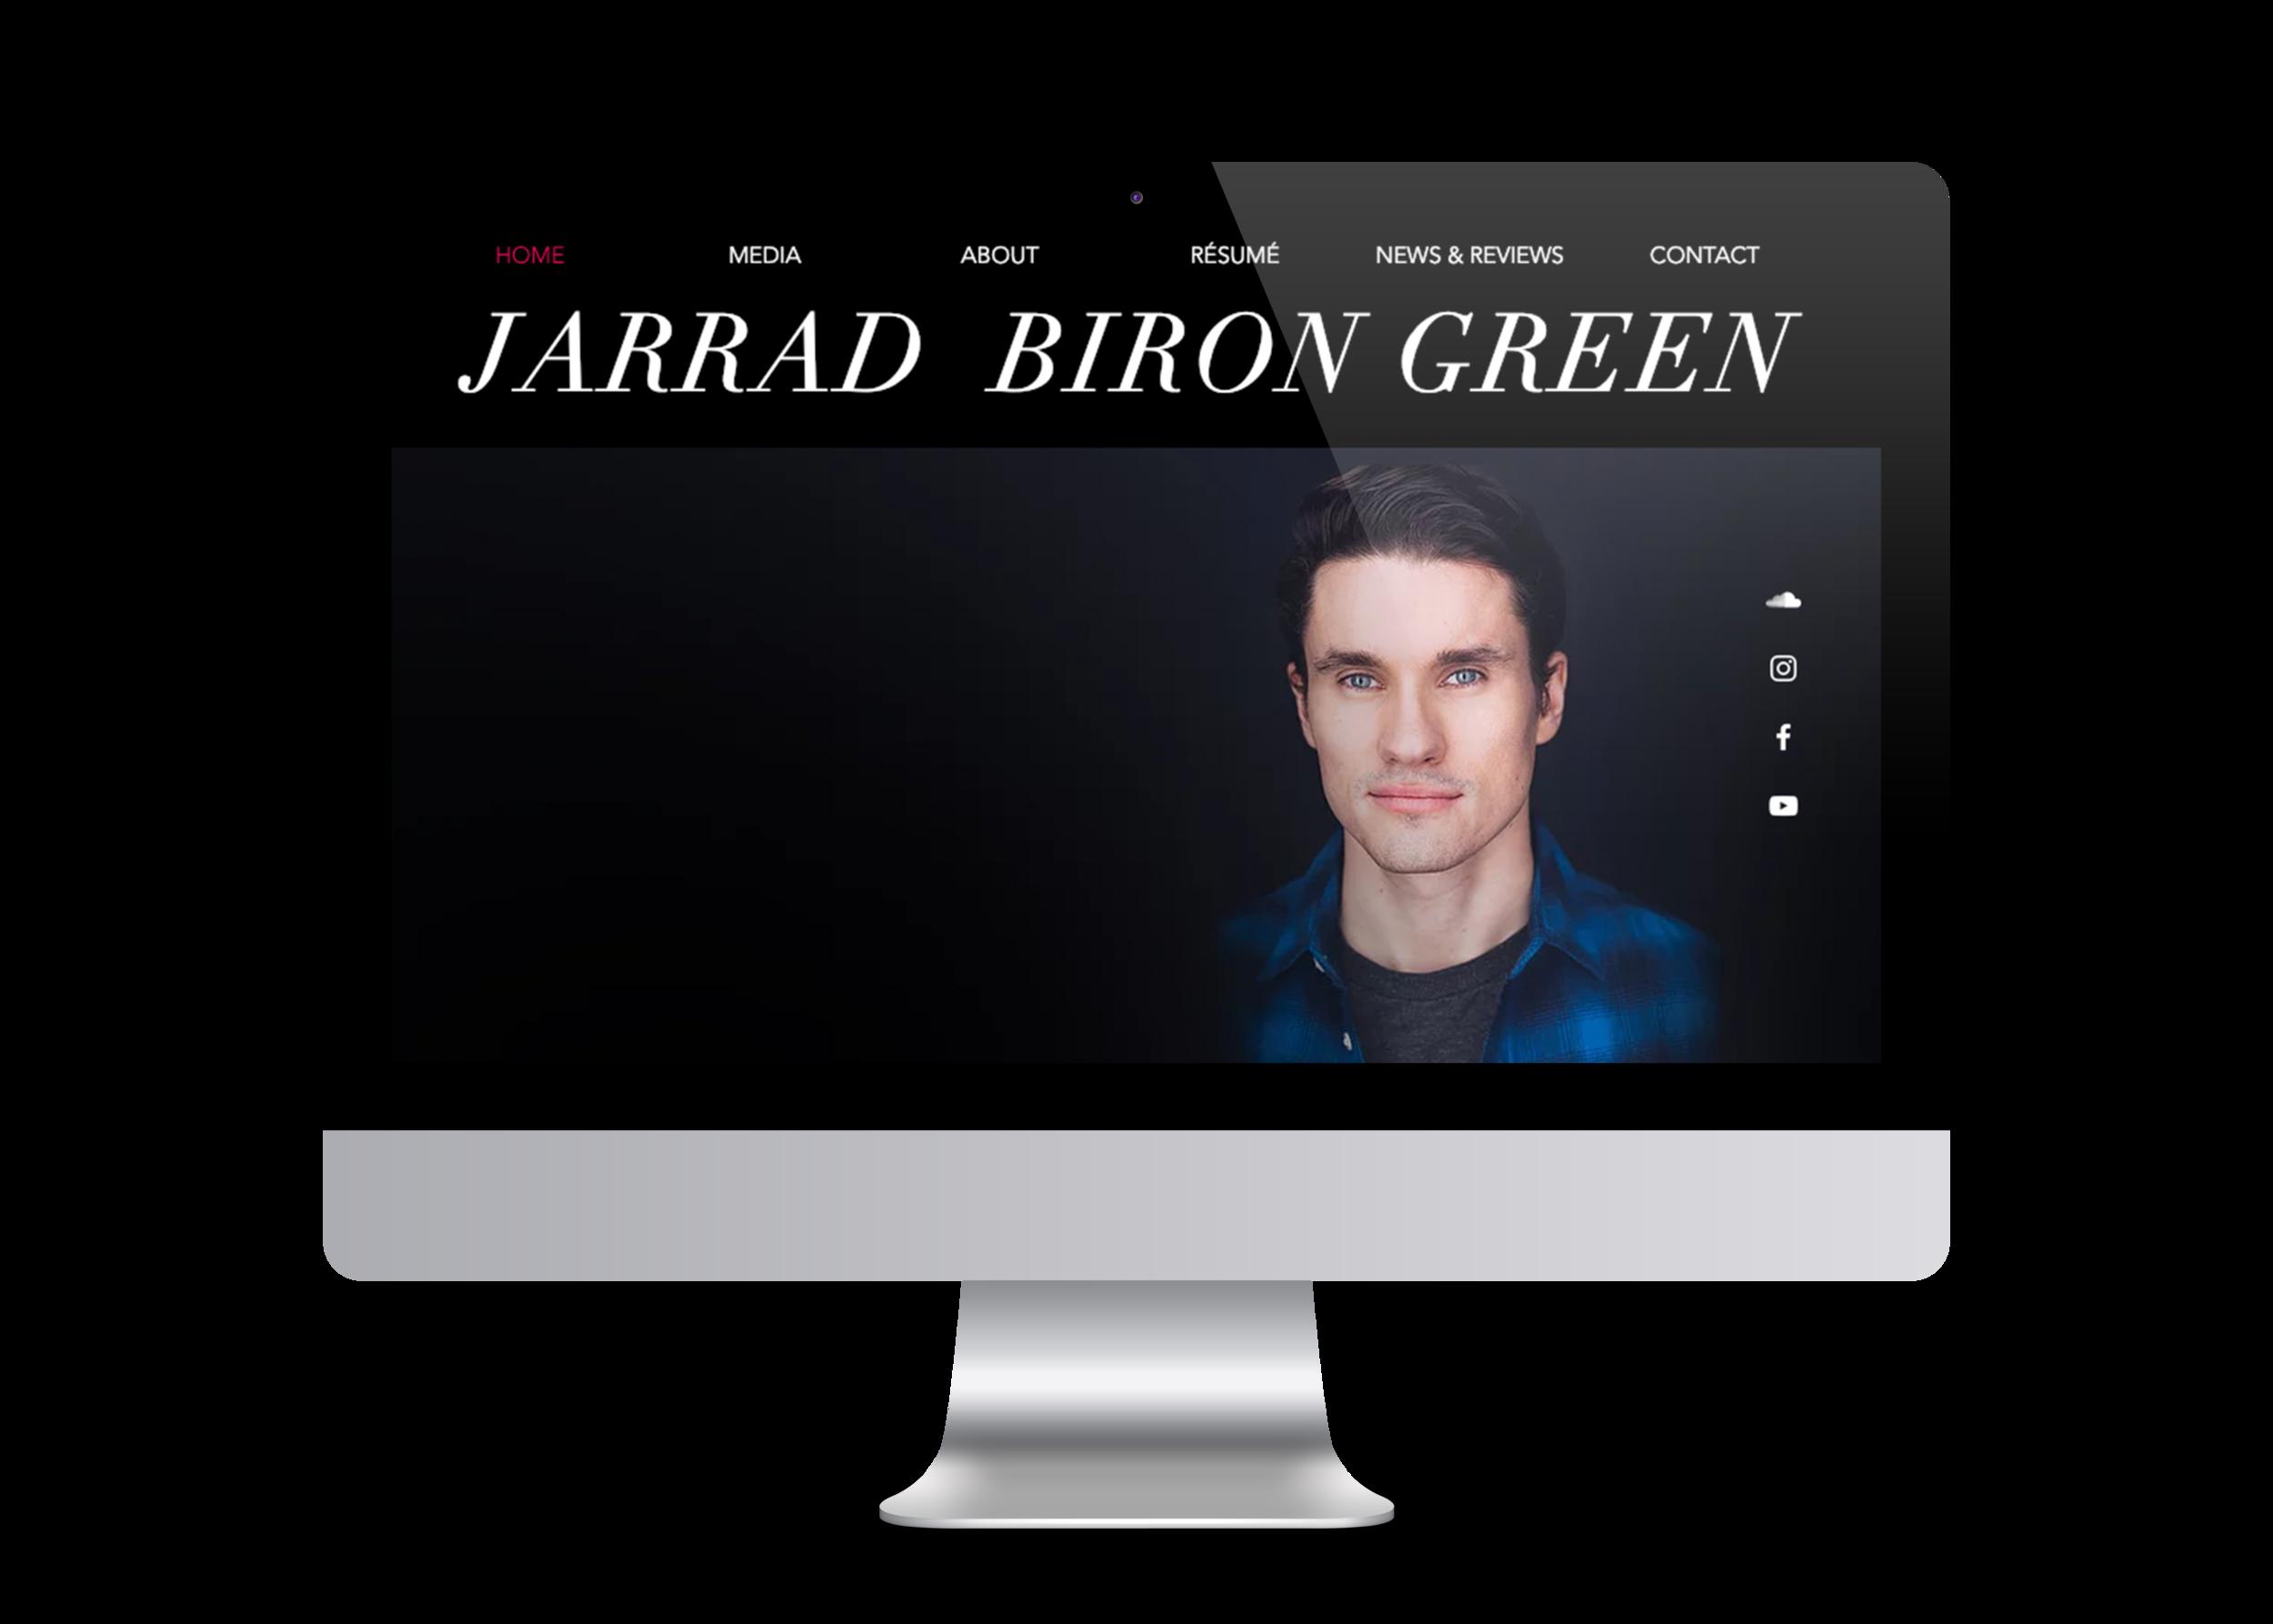 Jarrad Biron Green